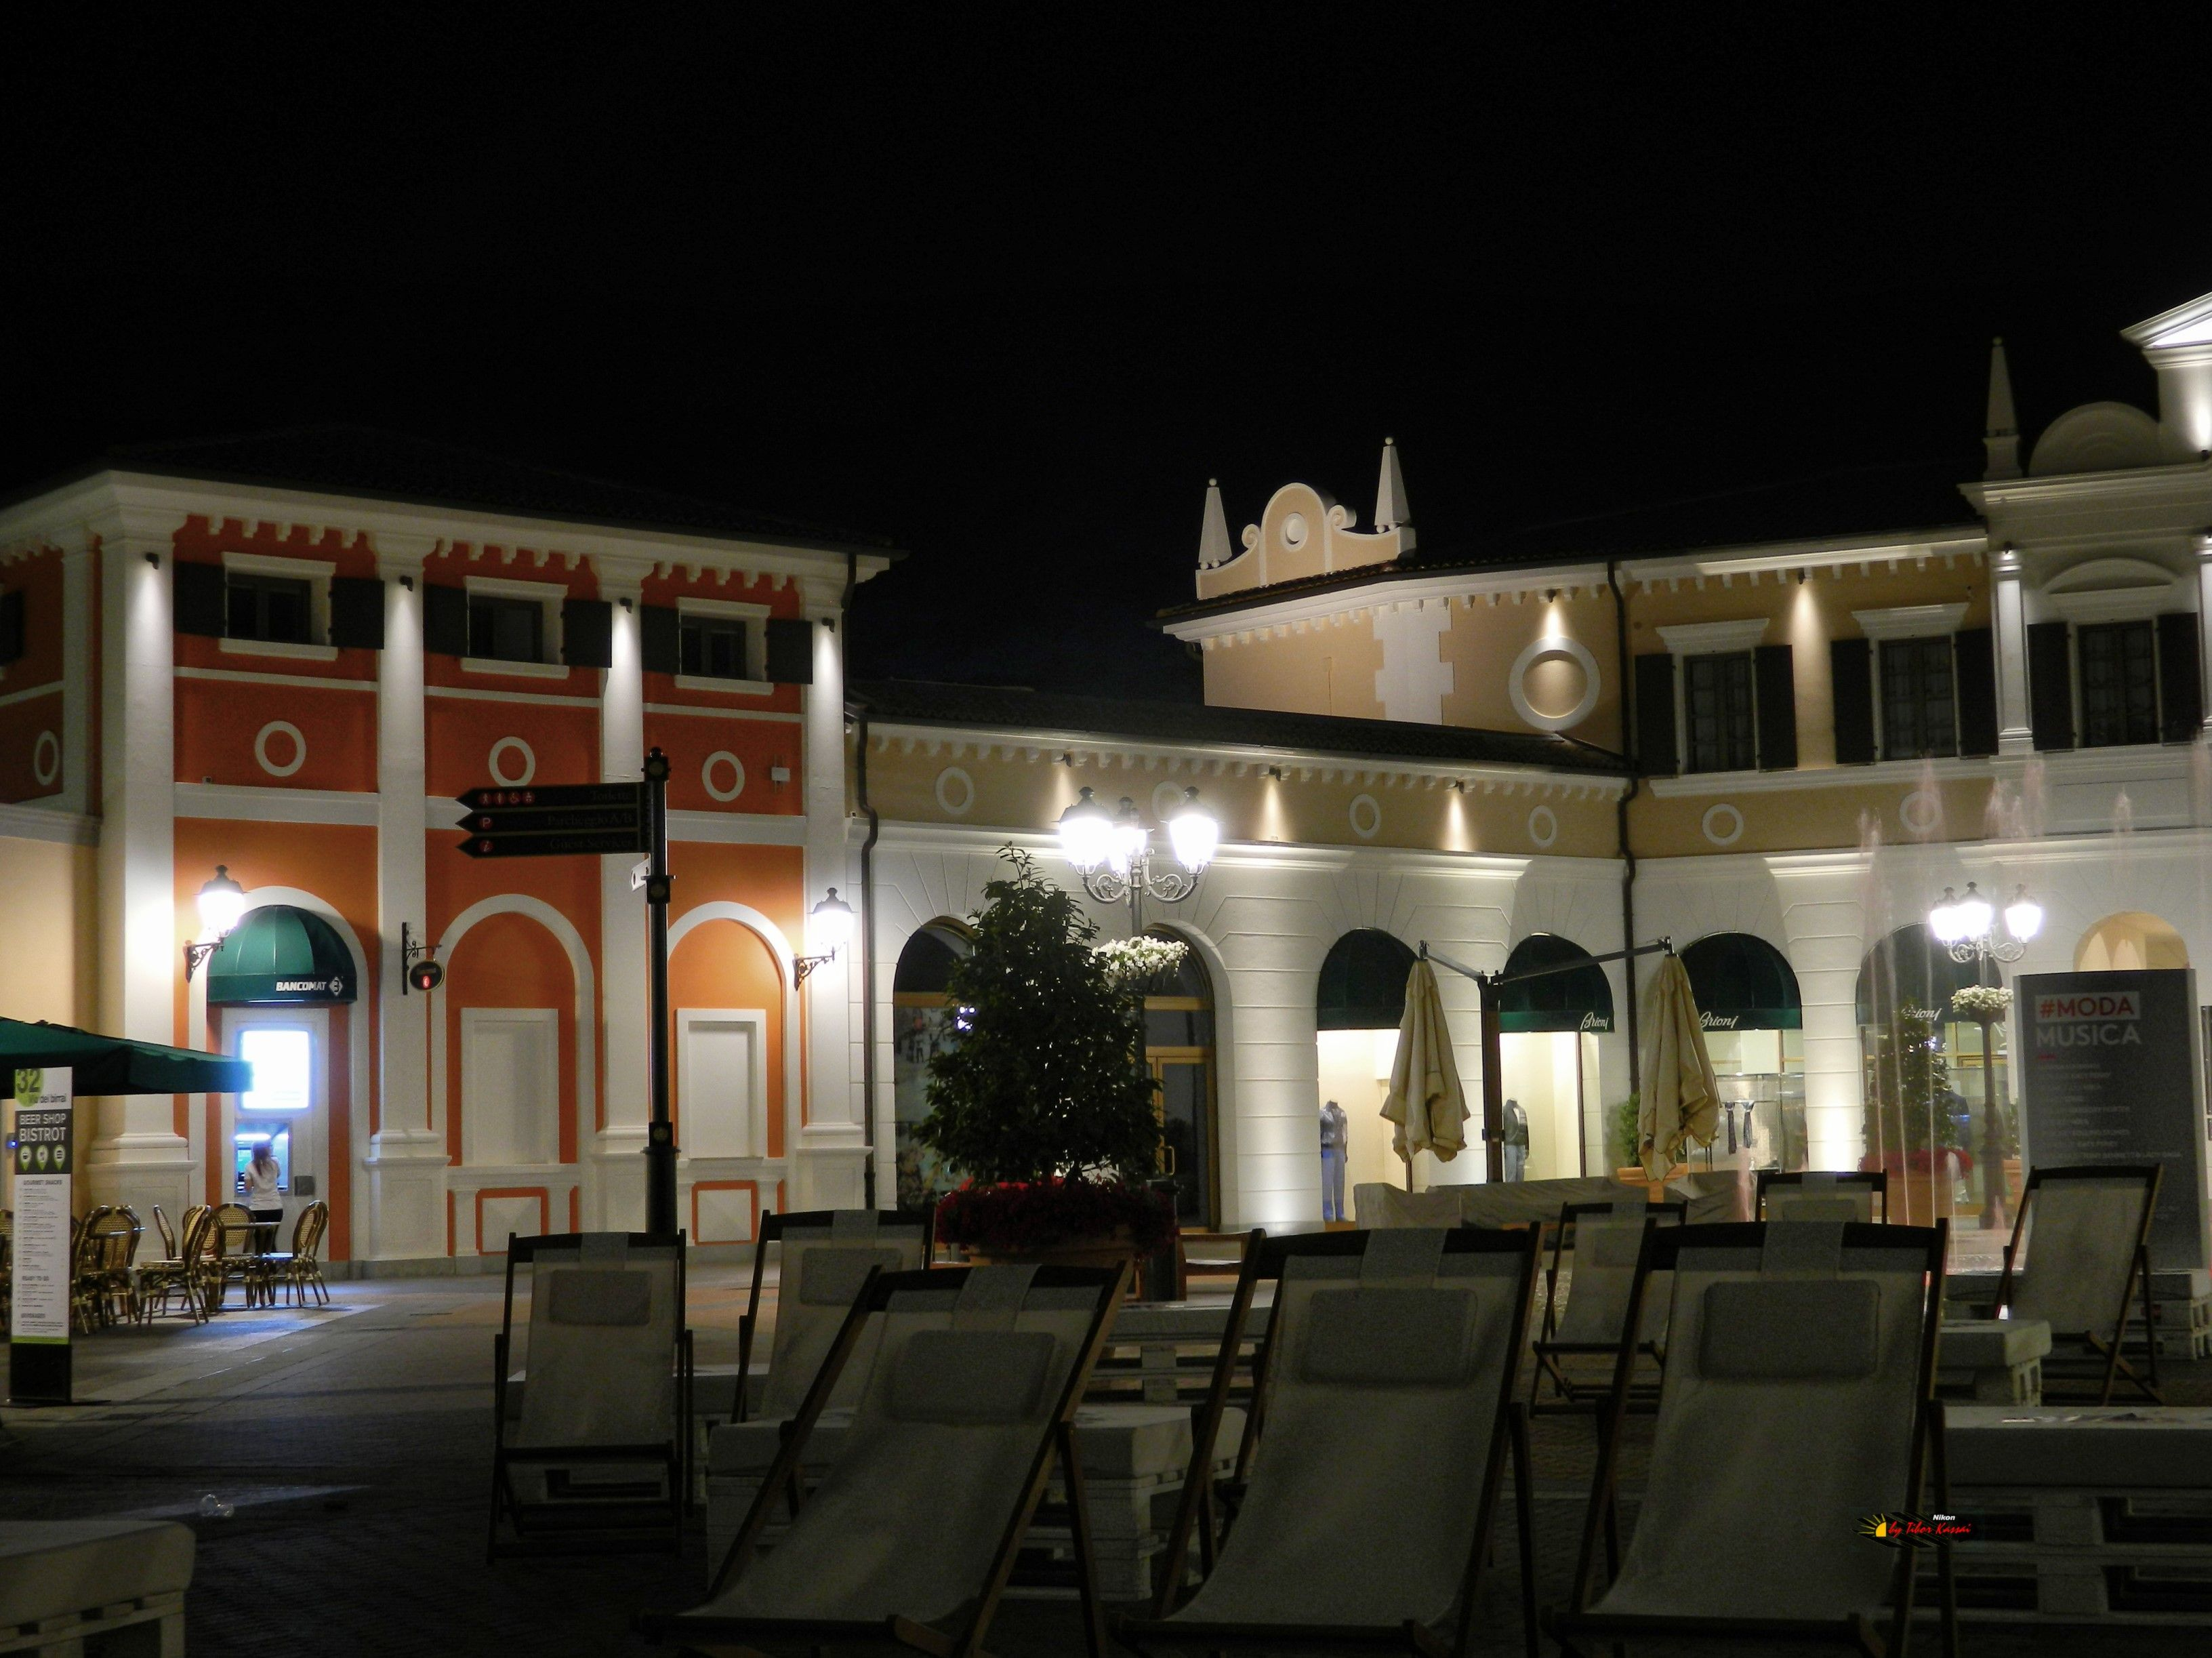 Noventa di Piave Designe Outlet Shopping Centre, Veneto region, Ita ...